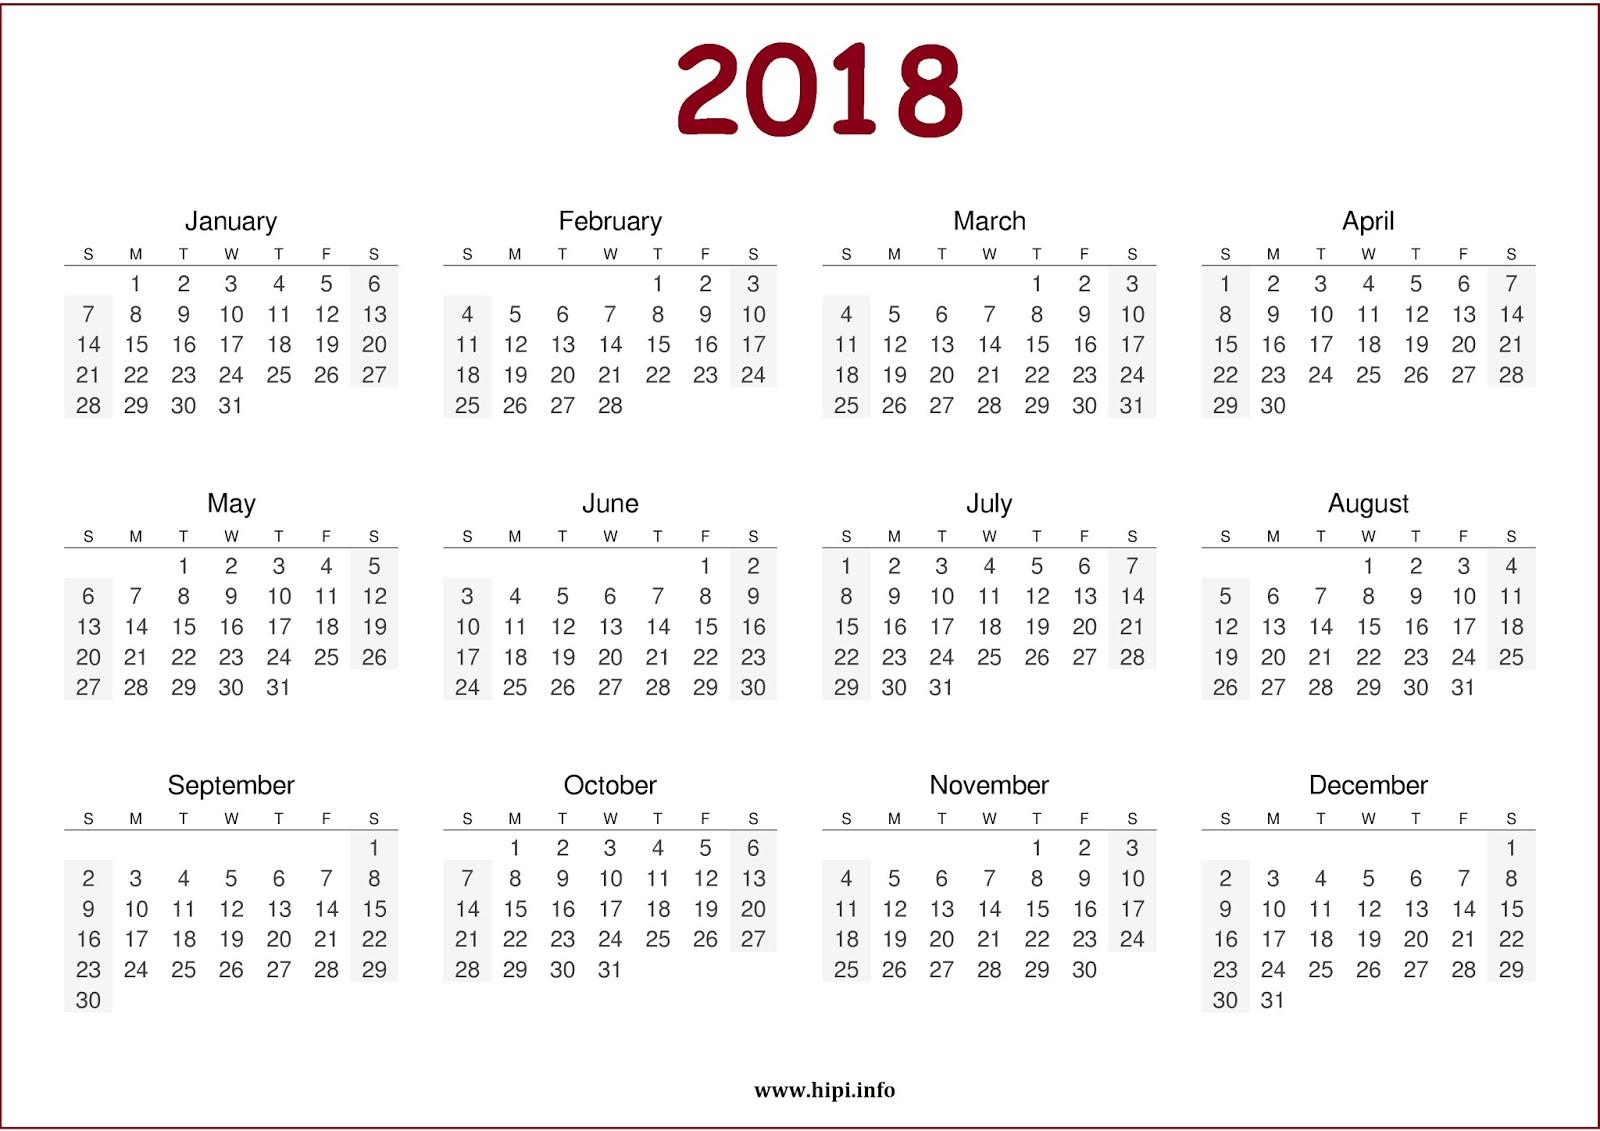 2018 Calendar Download 2018 monthly calendars 1600x1131